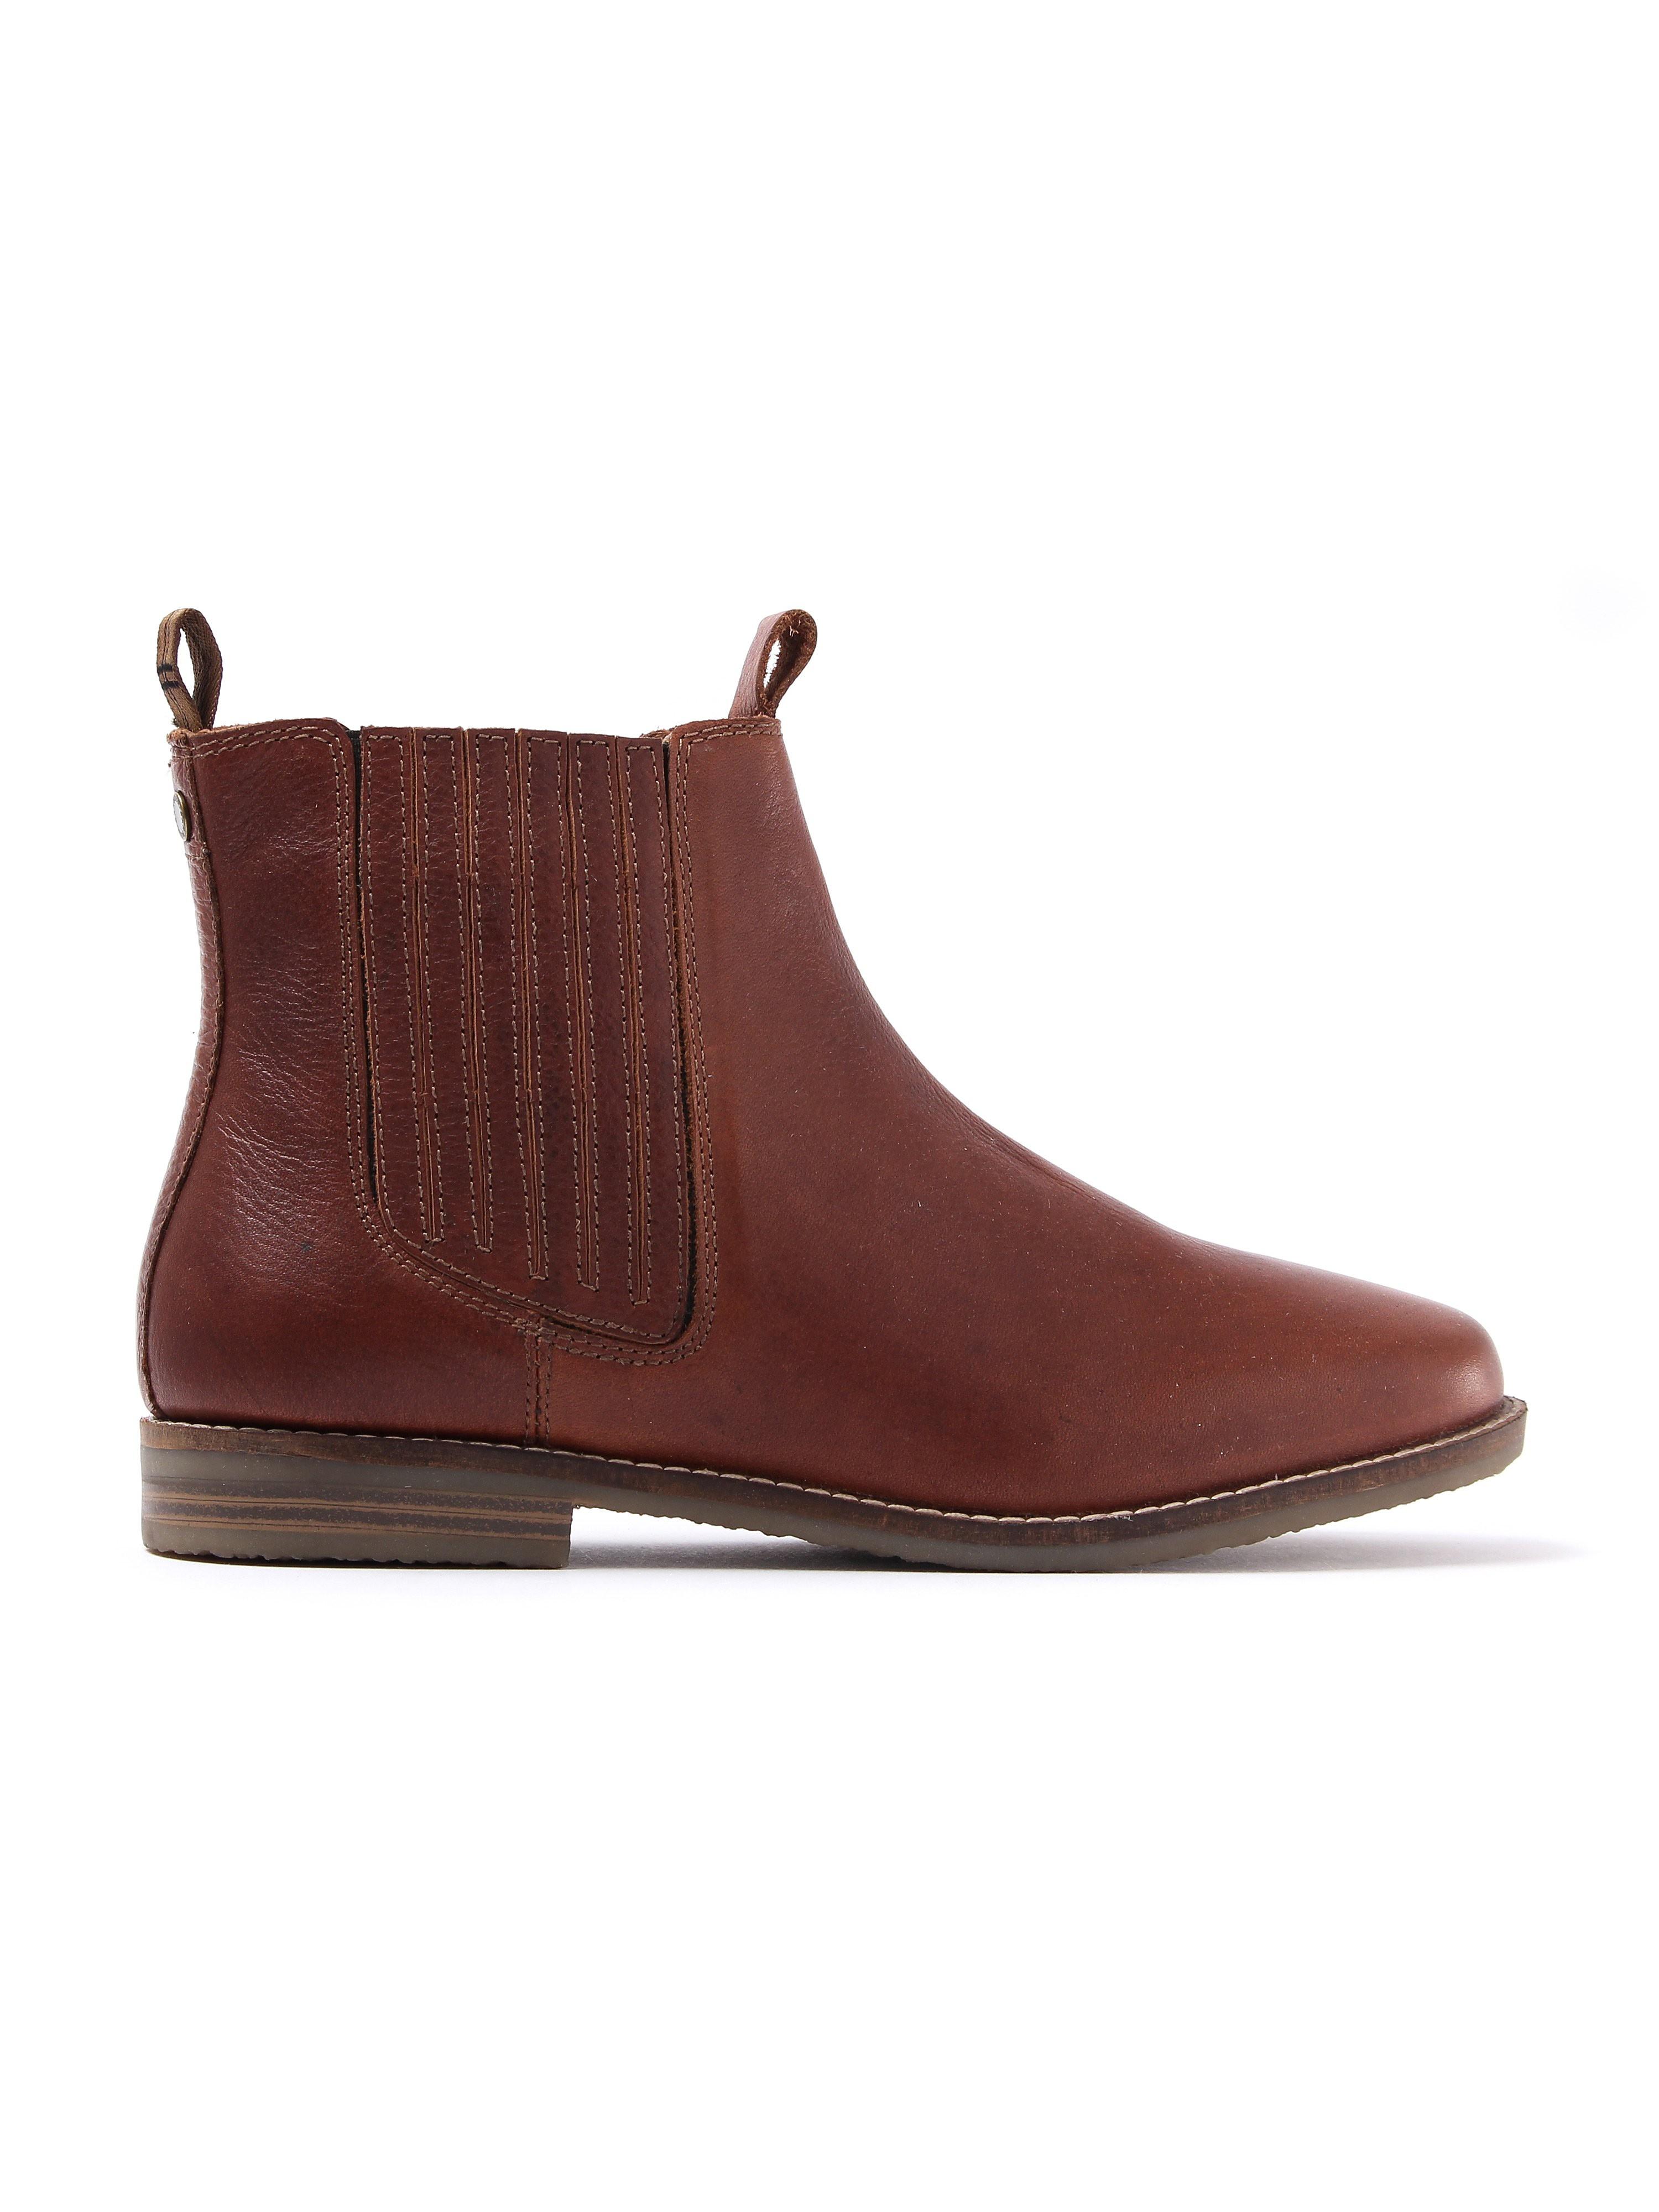 Barbour Women's Jamie Leather Chelsea Boots - Chestnut